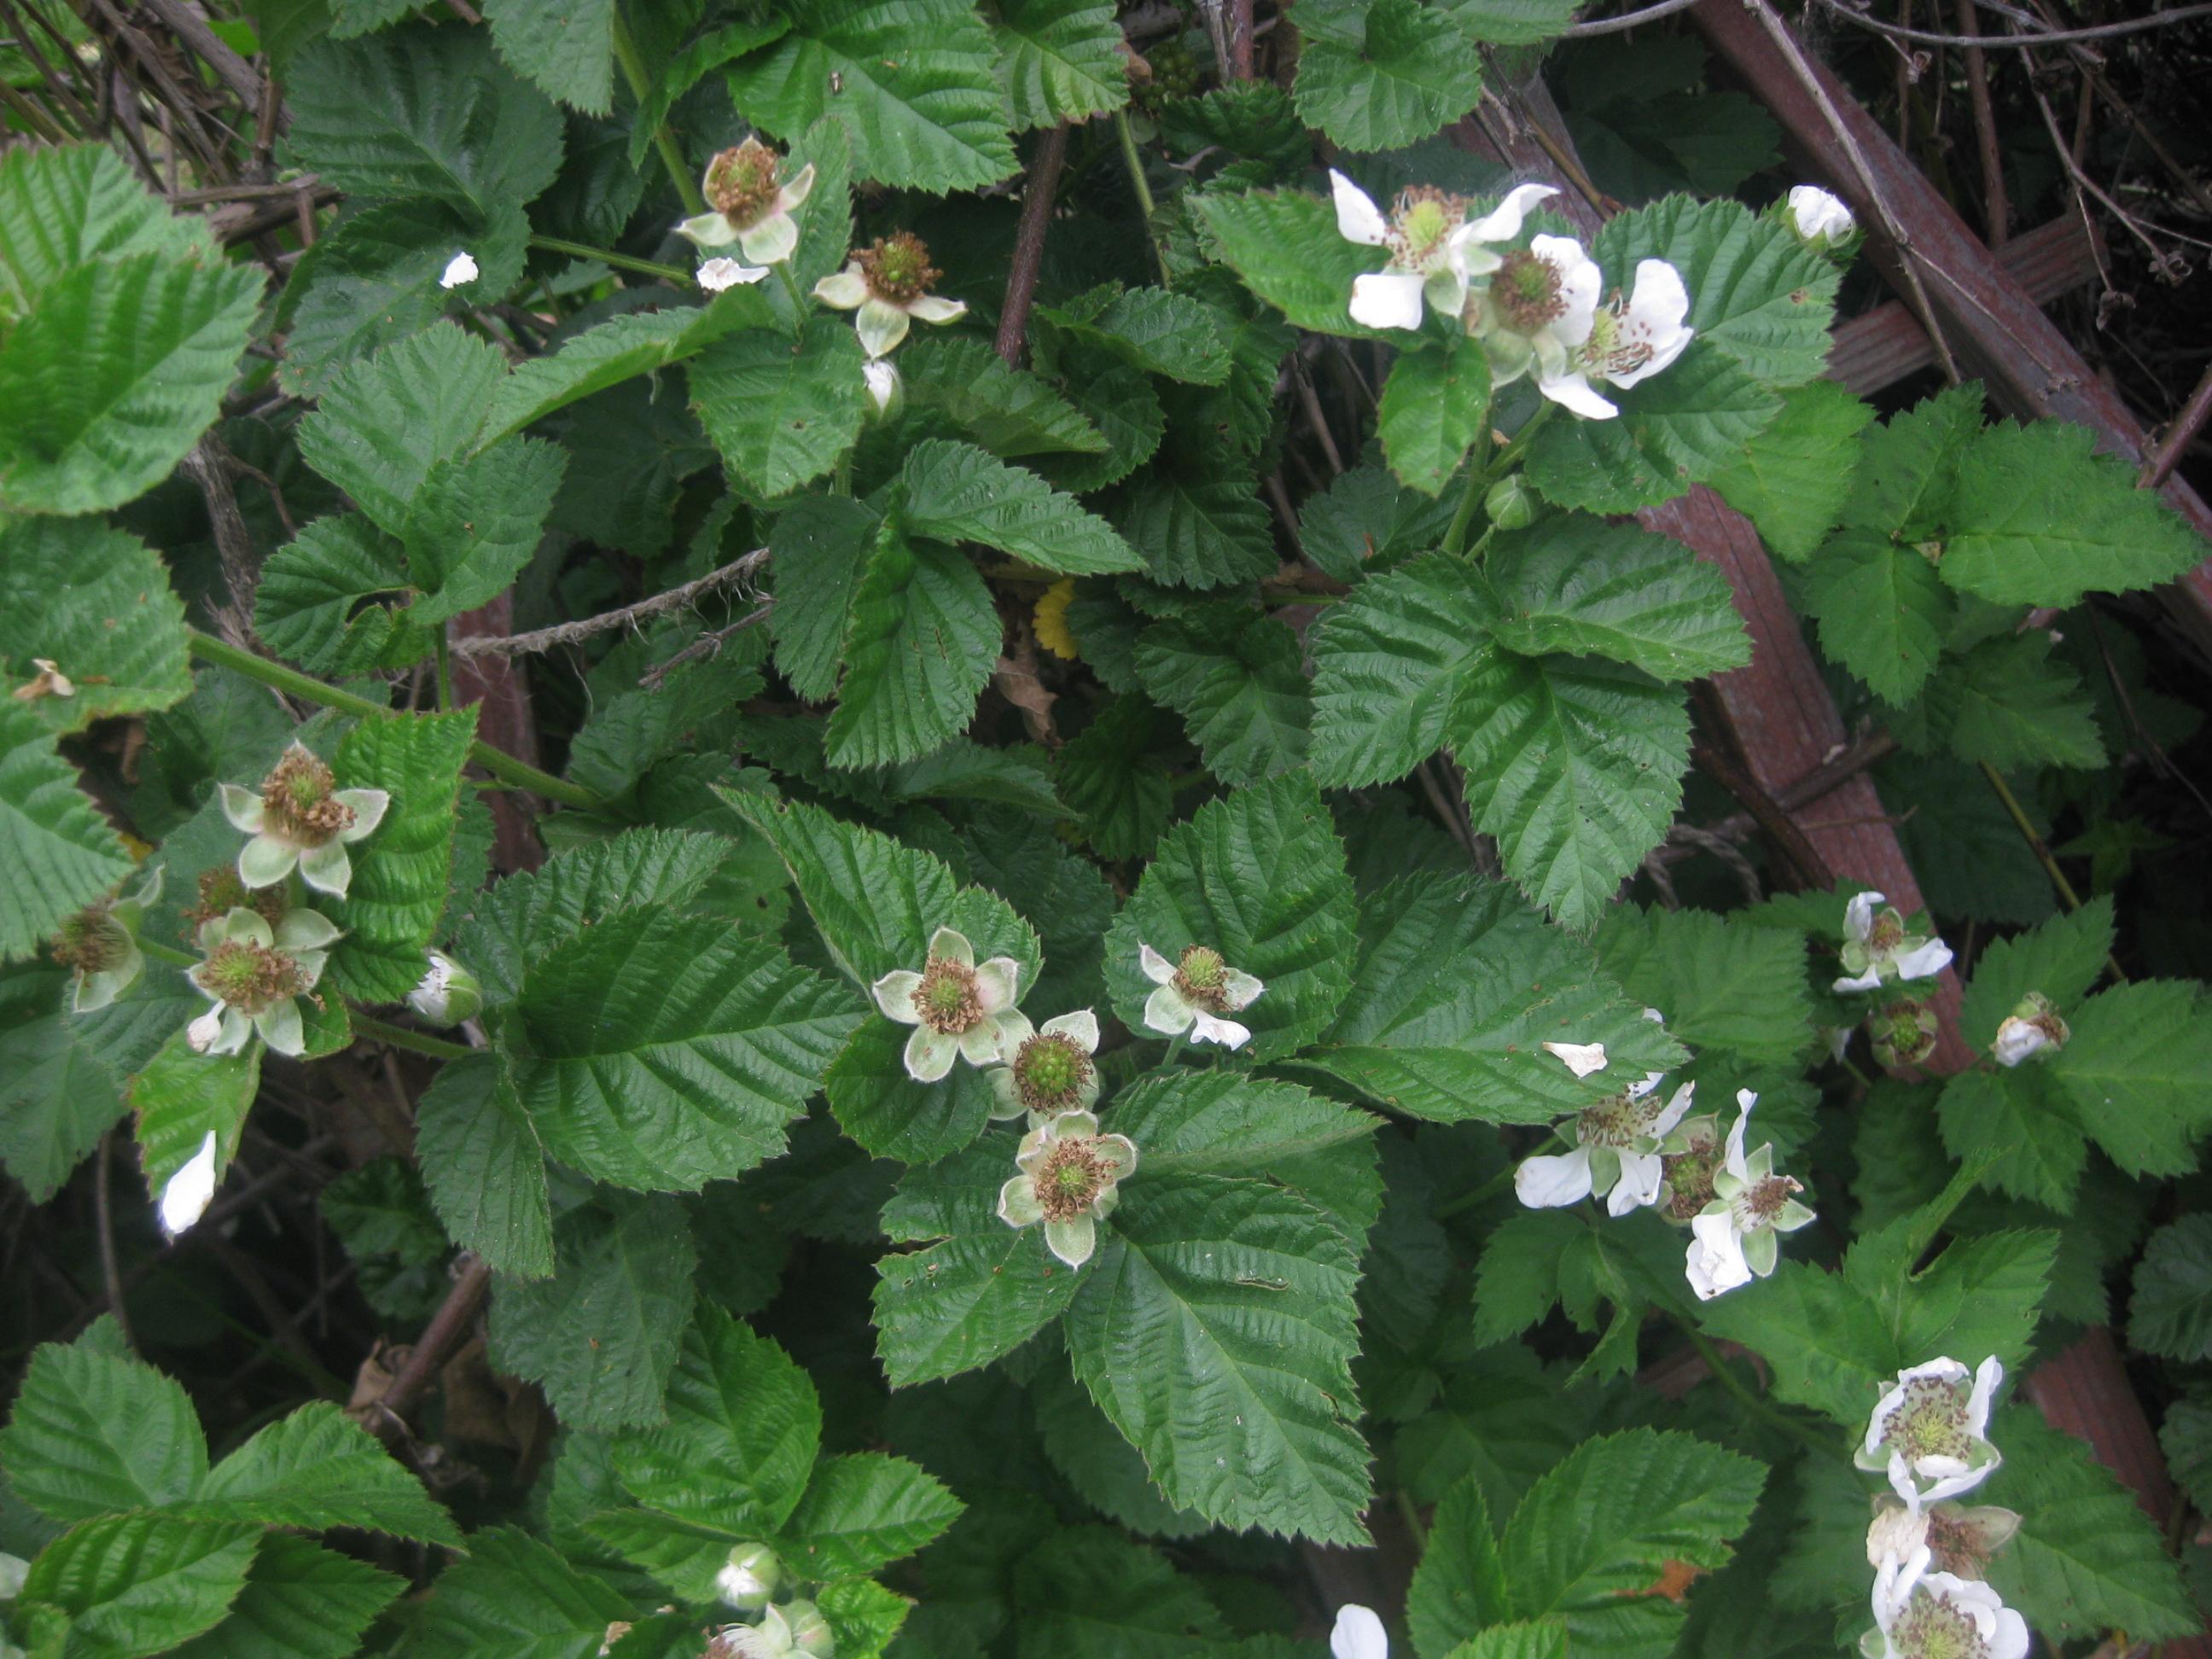 Drawn rose bush bramble bush To blackberry beginning end Raspberries